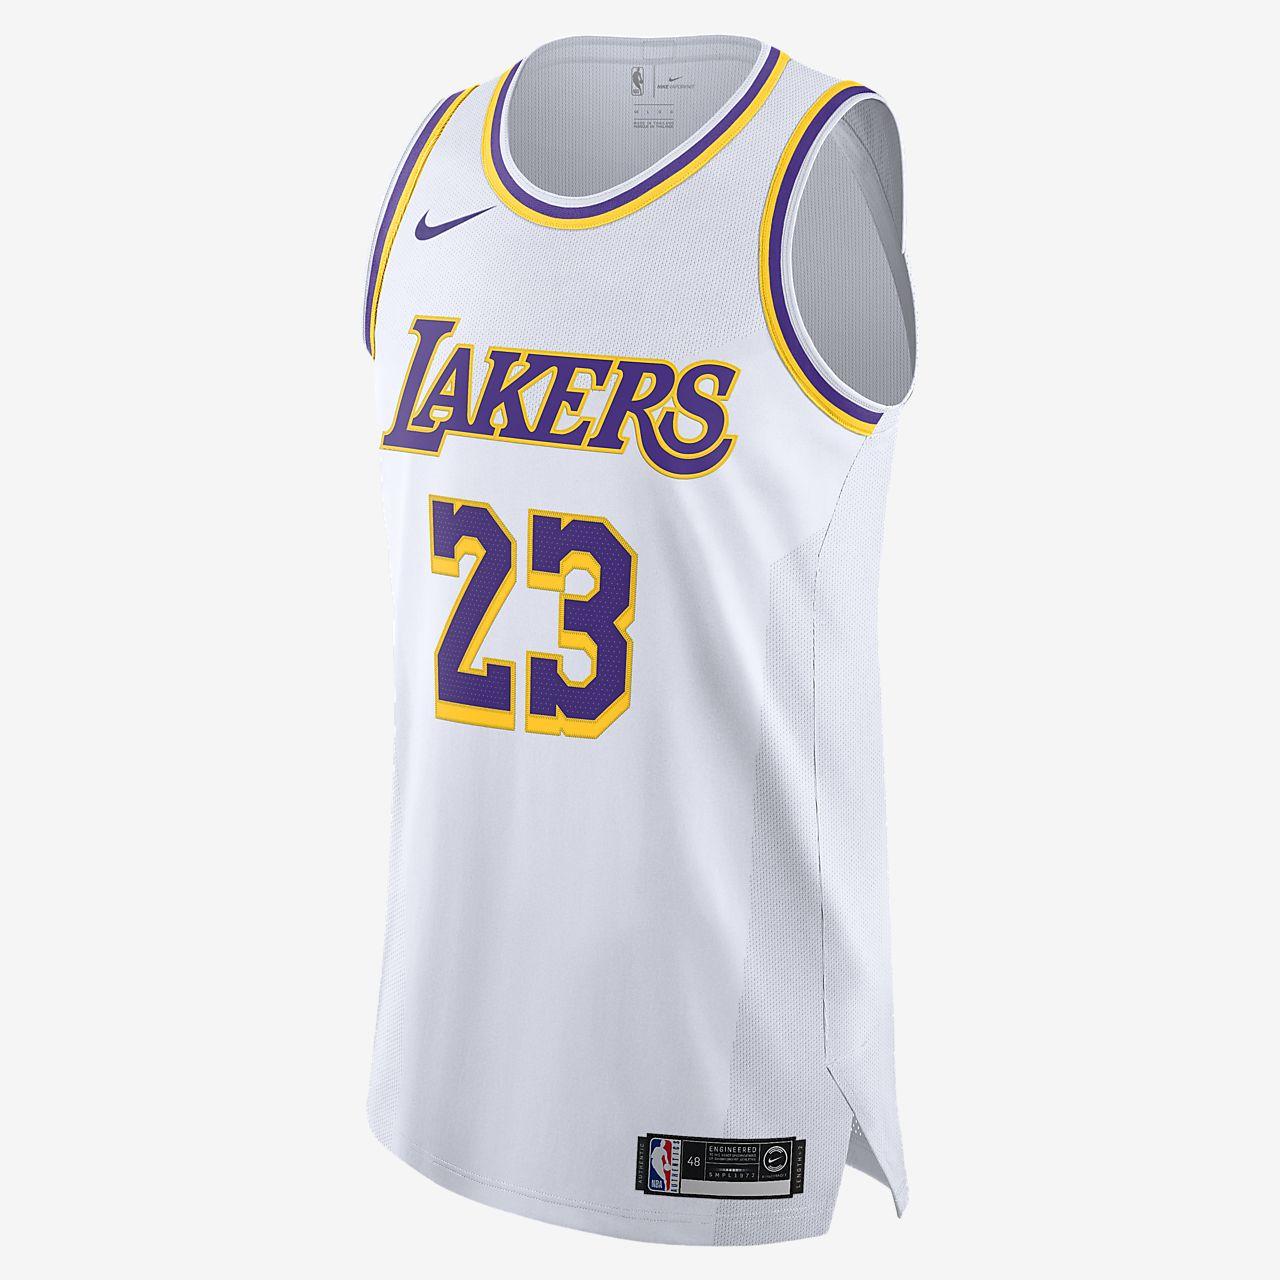 洛杉矶湖人队 (LeBron James) Association Edition Nike NBA Jersey 男子球衣